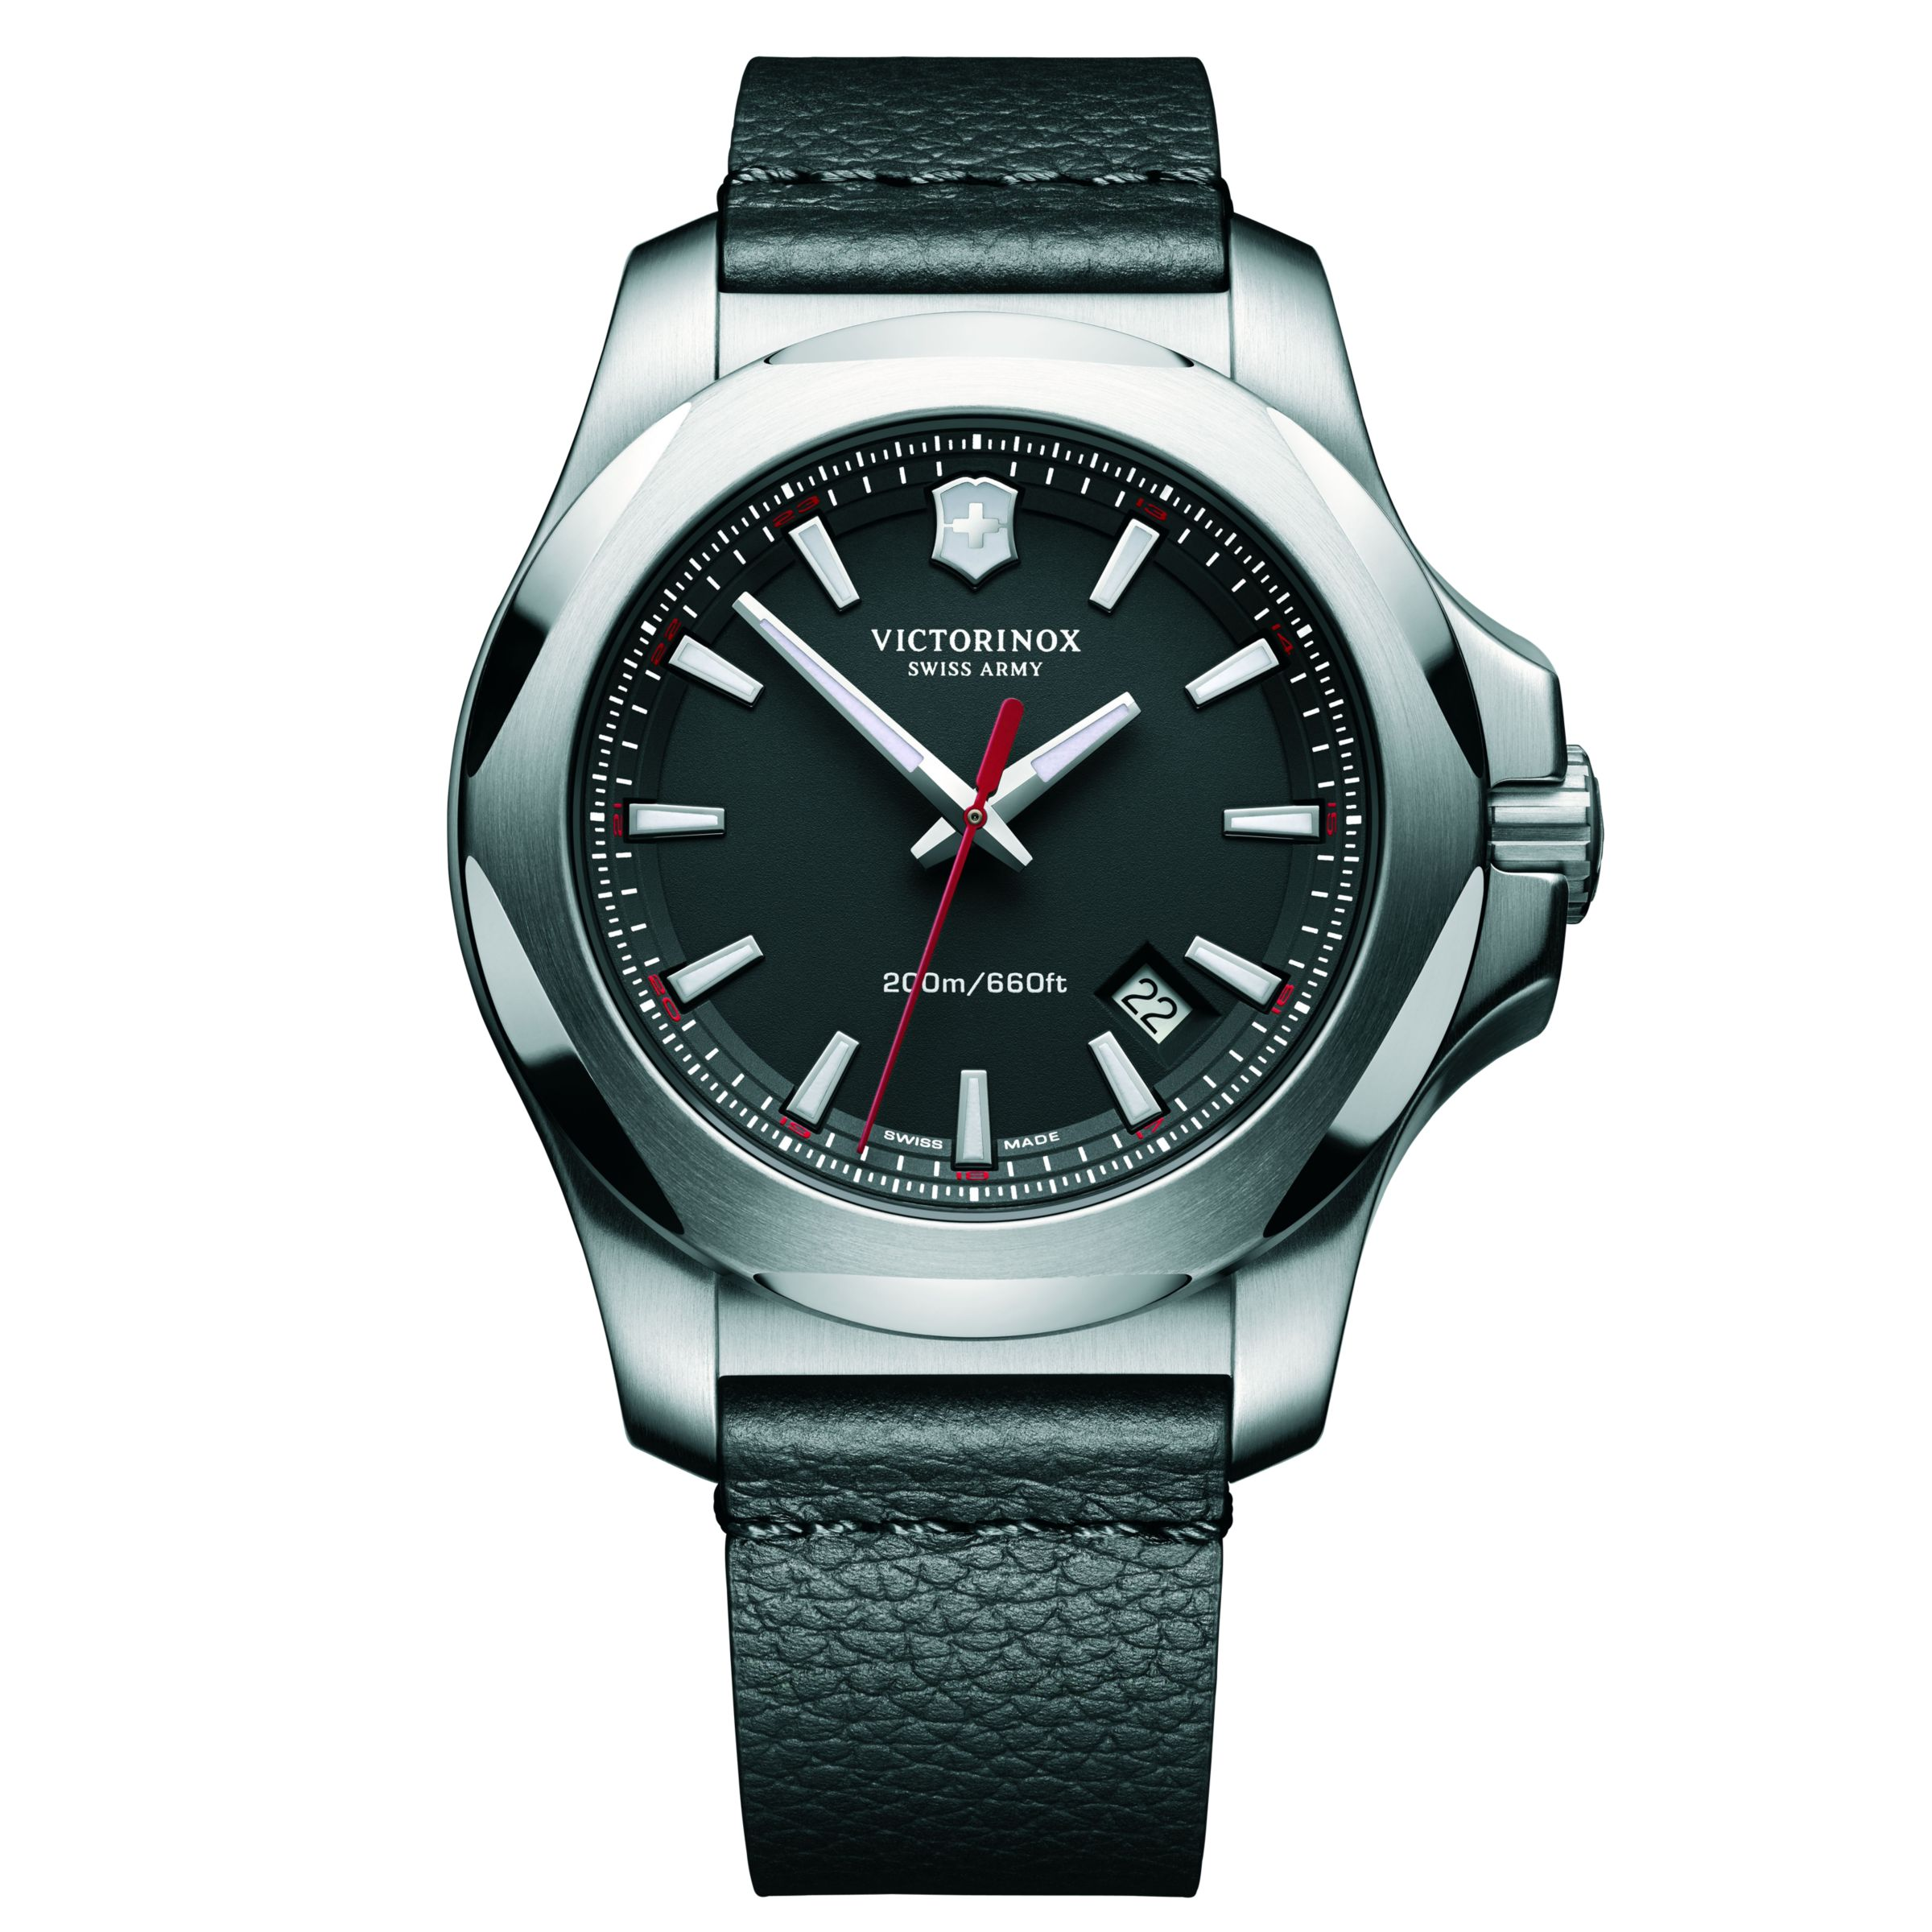 Victorinox Victorinox 241737 Men's I.N.O.X Date Leather Strap Watch, Black